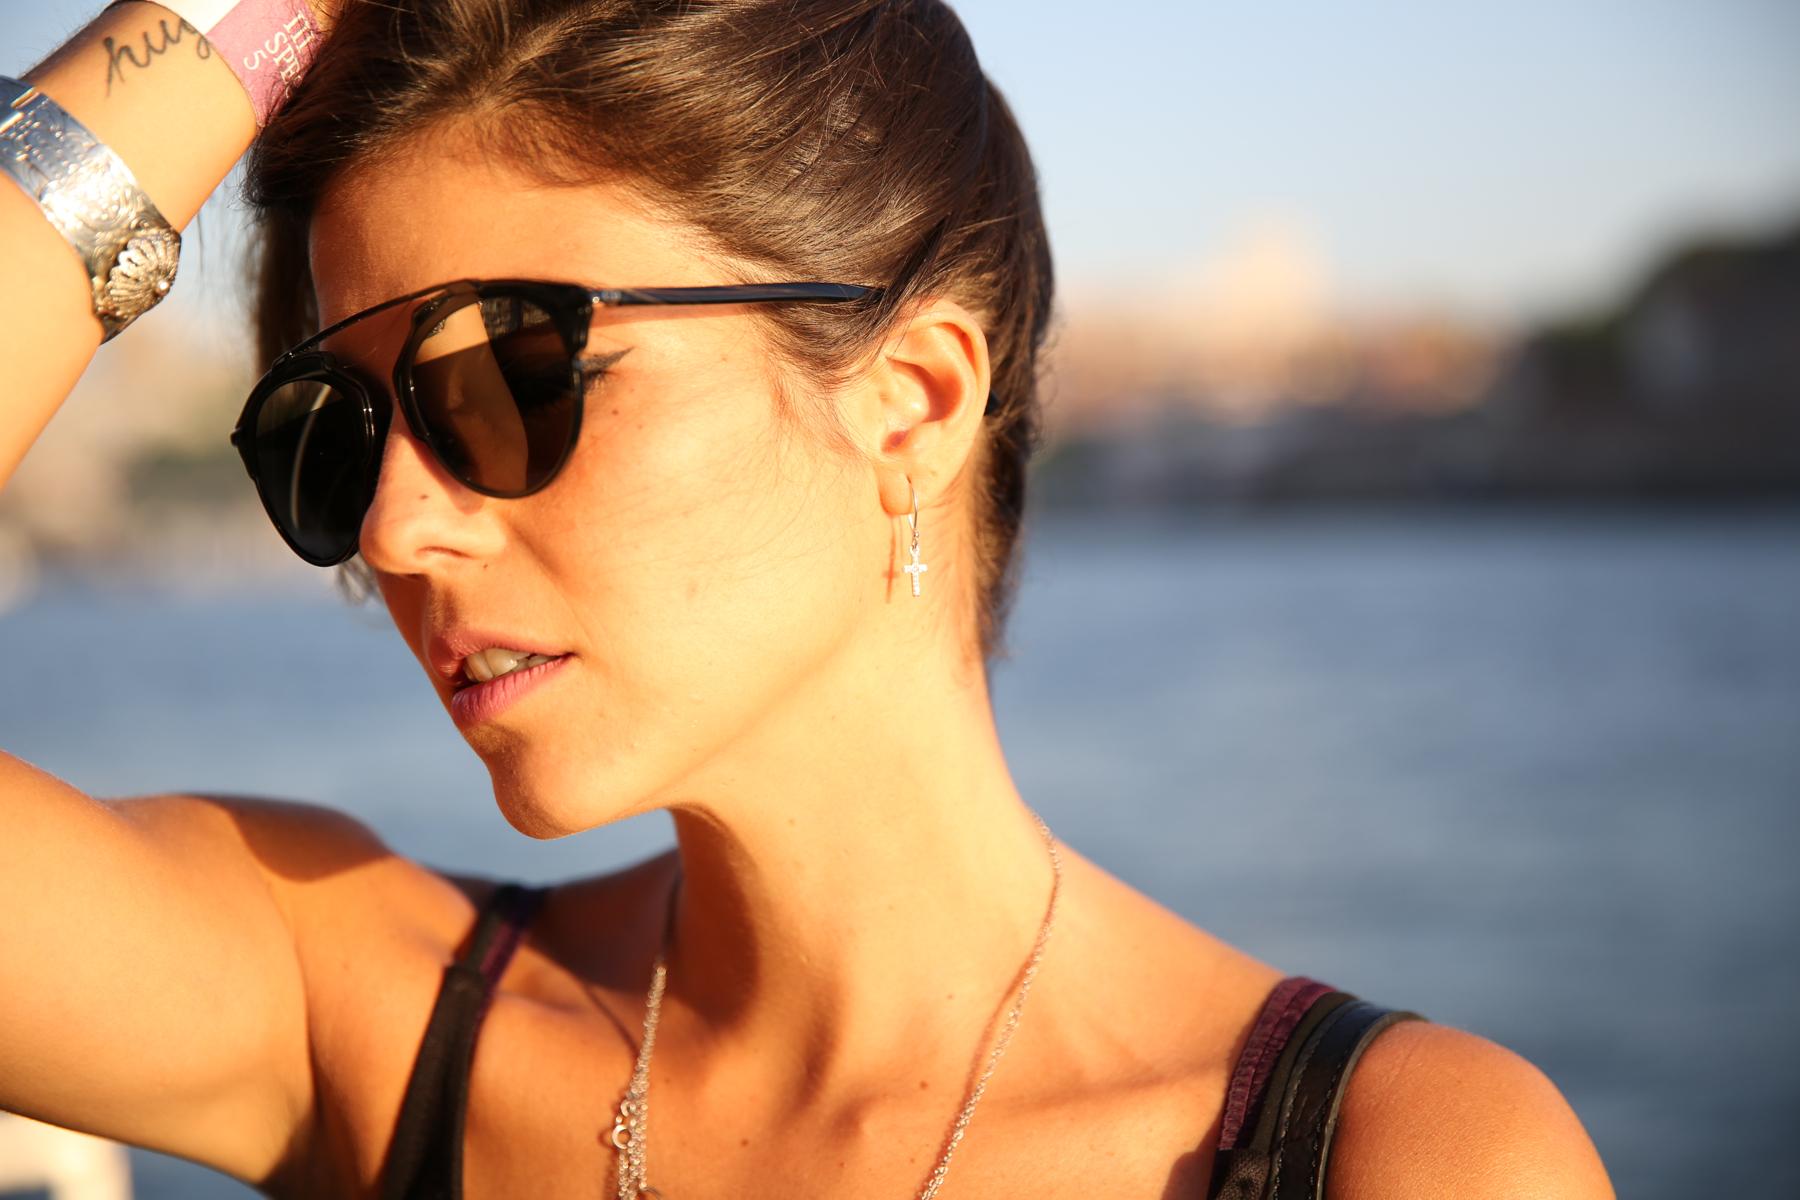 trendy_taste-look-outfit-street_style-ootd-blog-blogger-fashion_spain-moda_españa-salsa_jeans-dior_gafas-bolso_flecos-fringes_bag-khaki_shorts-shorts_caqui-grey_tee-camiseta_gris-verano-porto-portugal-2